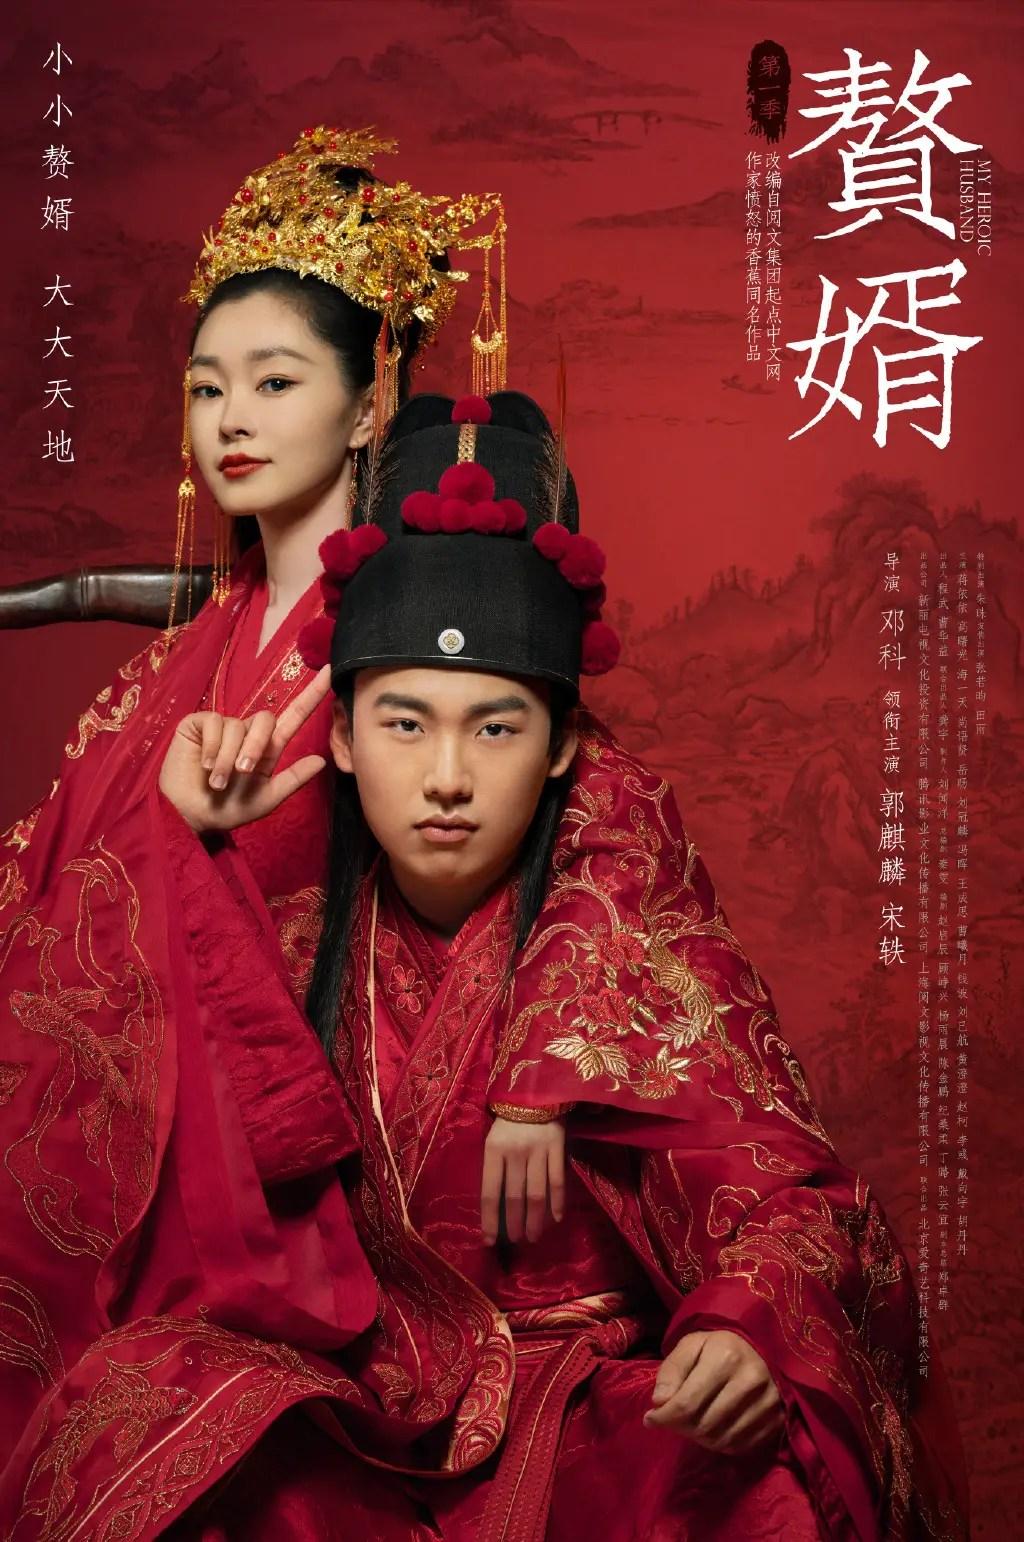 My Heroic Husband Chinese Drama Poster